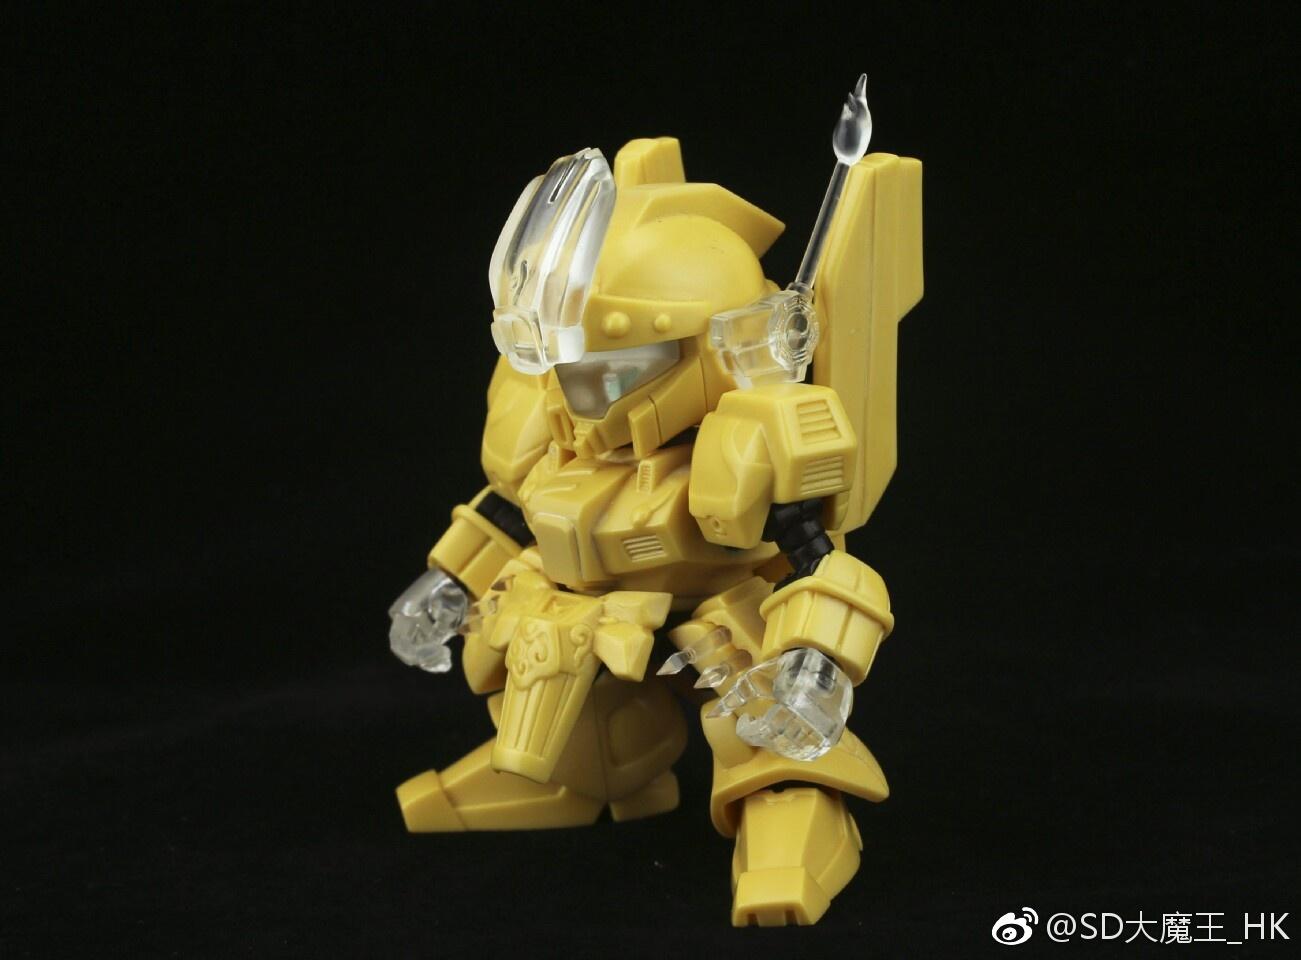 G236_jyo_sd_daimaou_inask_009.jpg